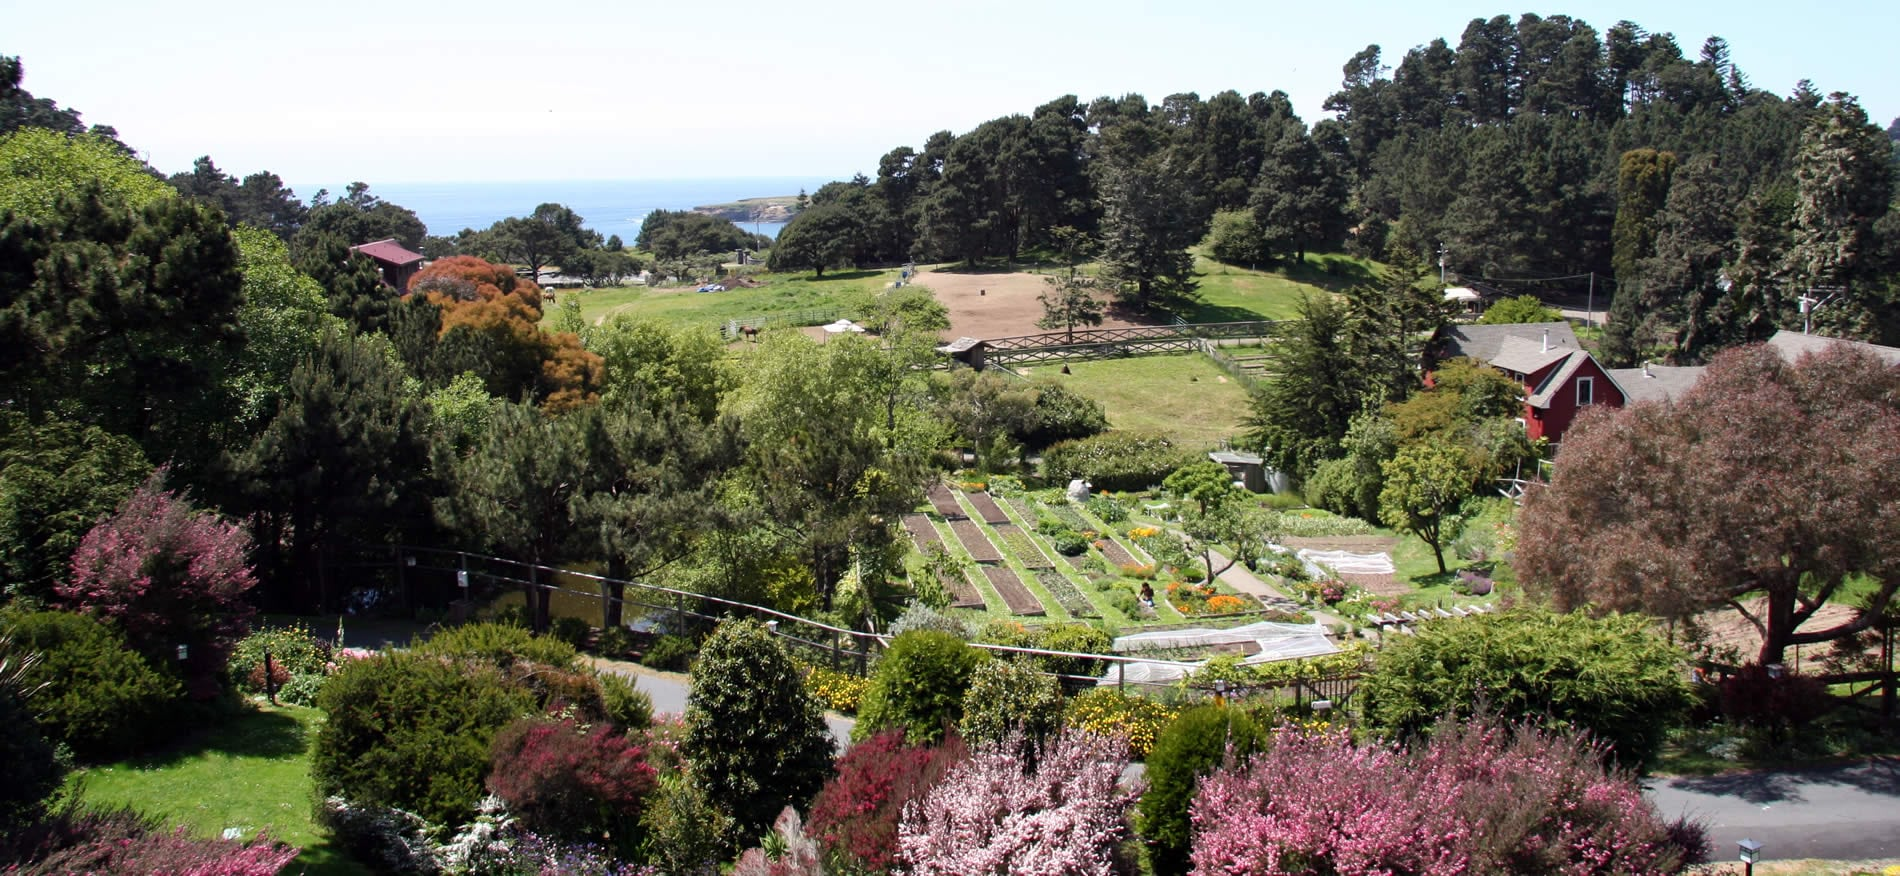 stanford inn mendocino hotel & resort ocean view over the gardens